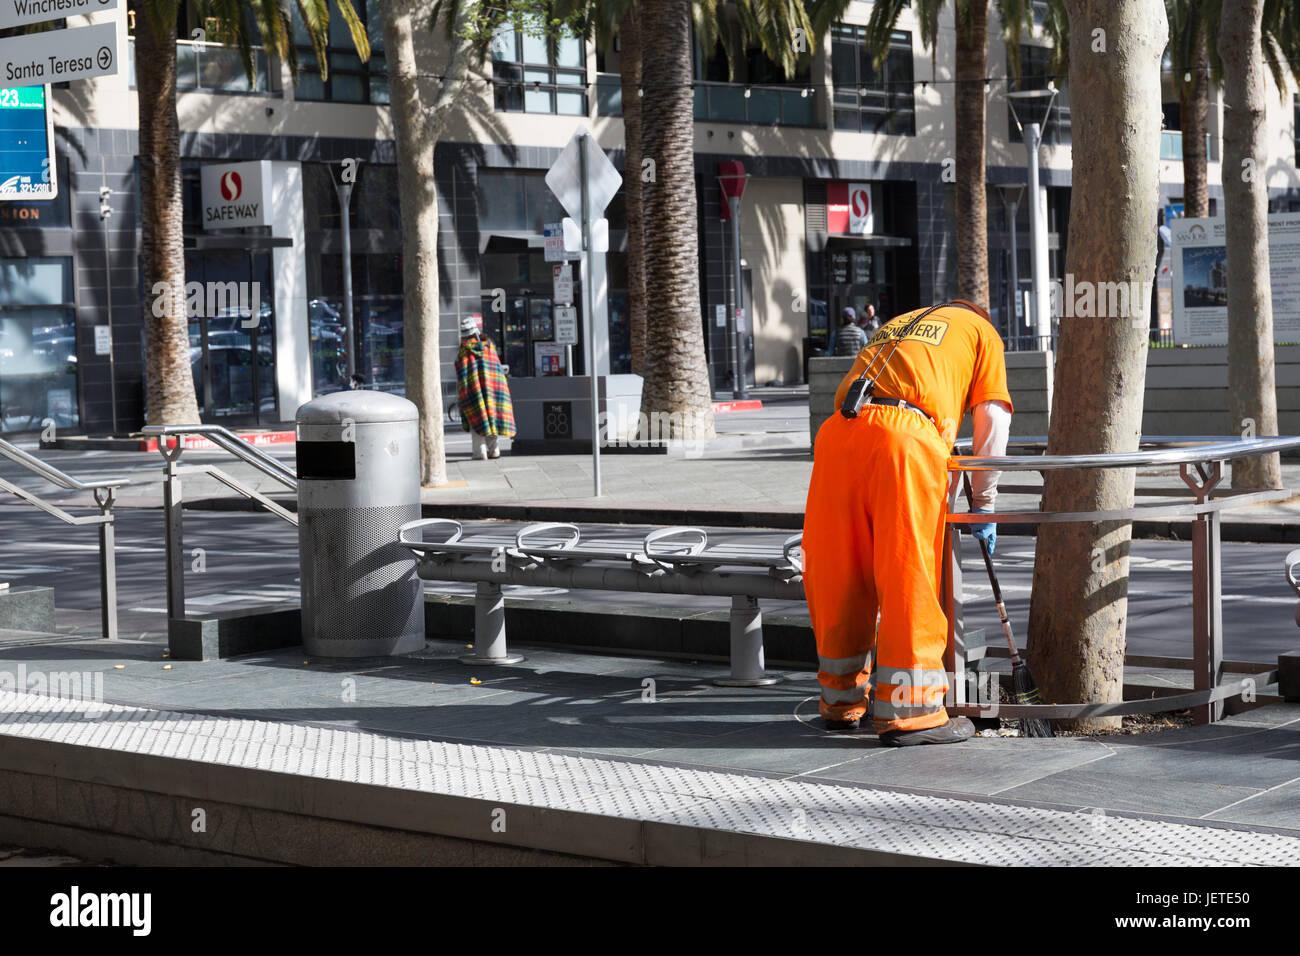 Downtown San Jose tram line - Stock Image